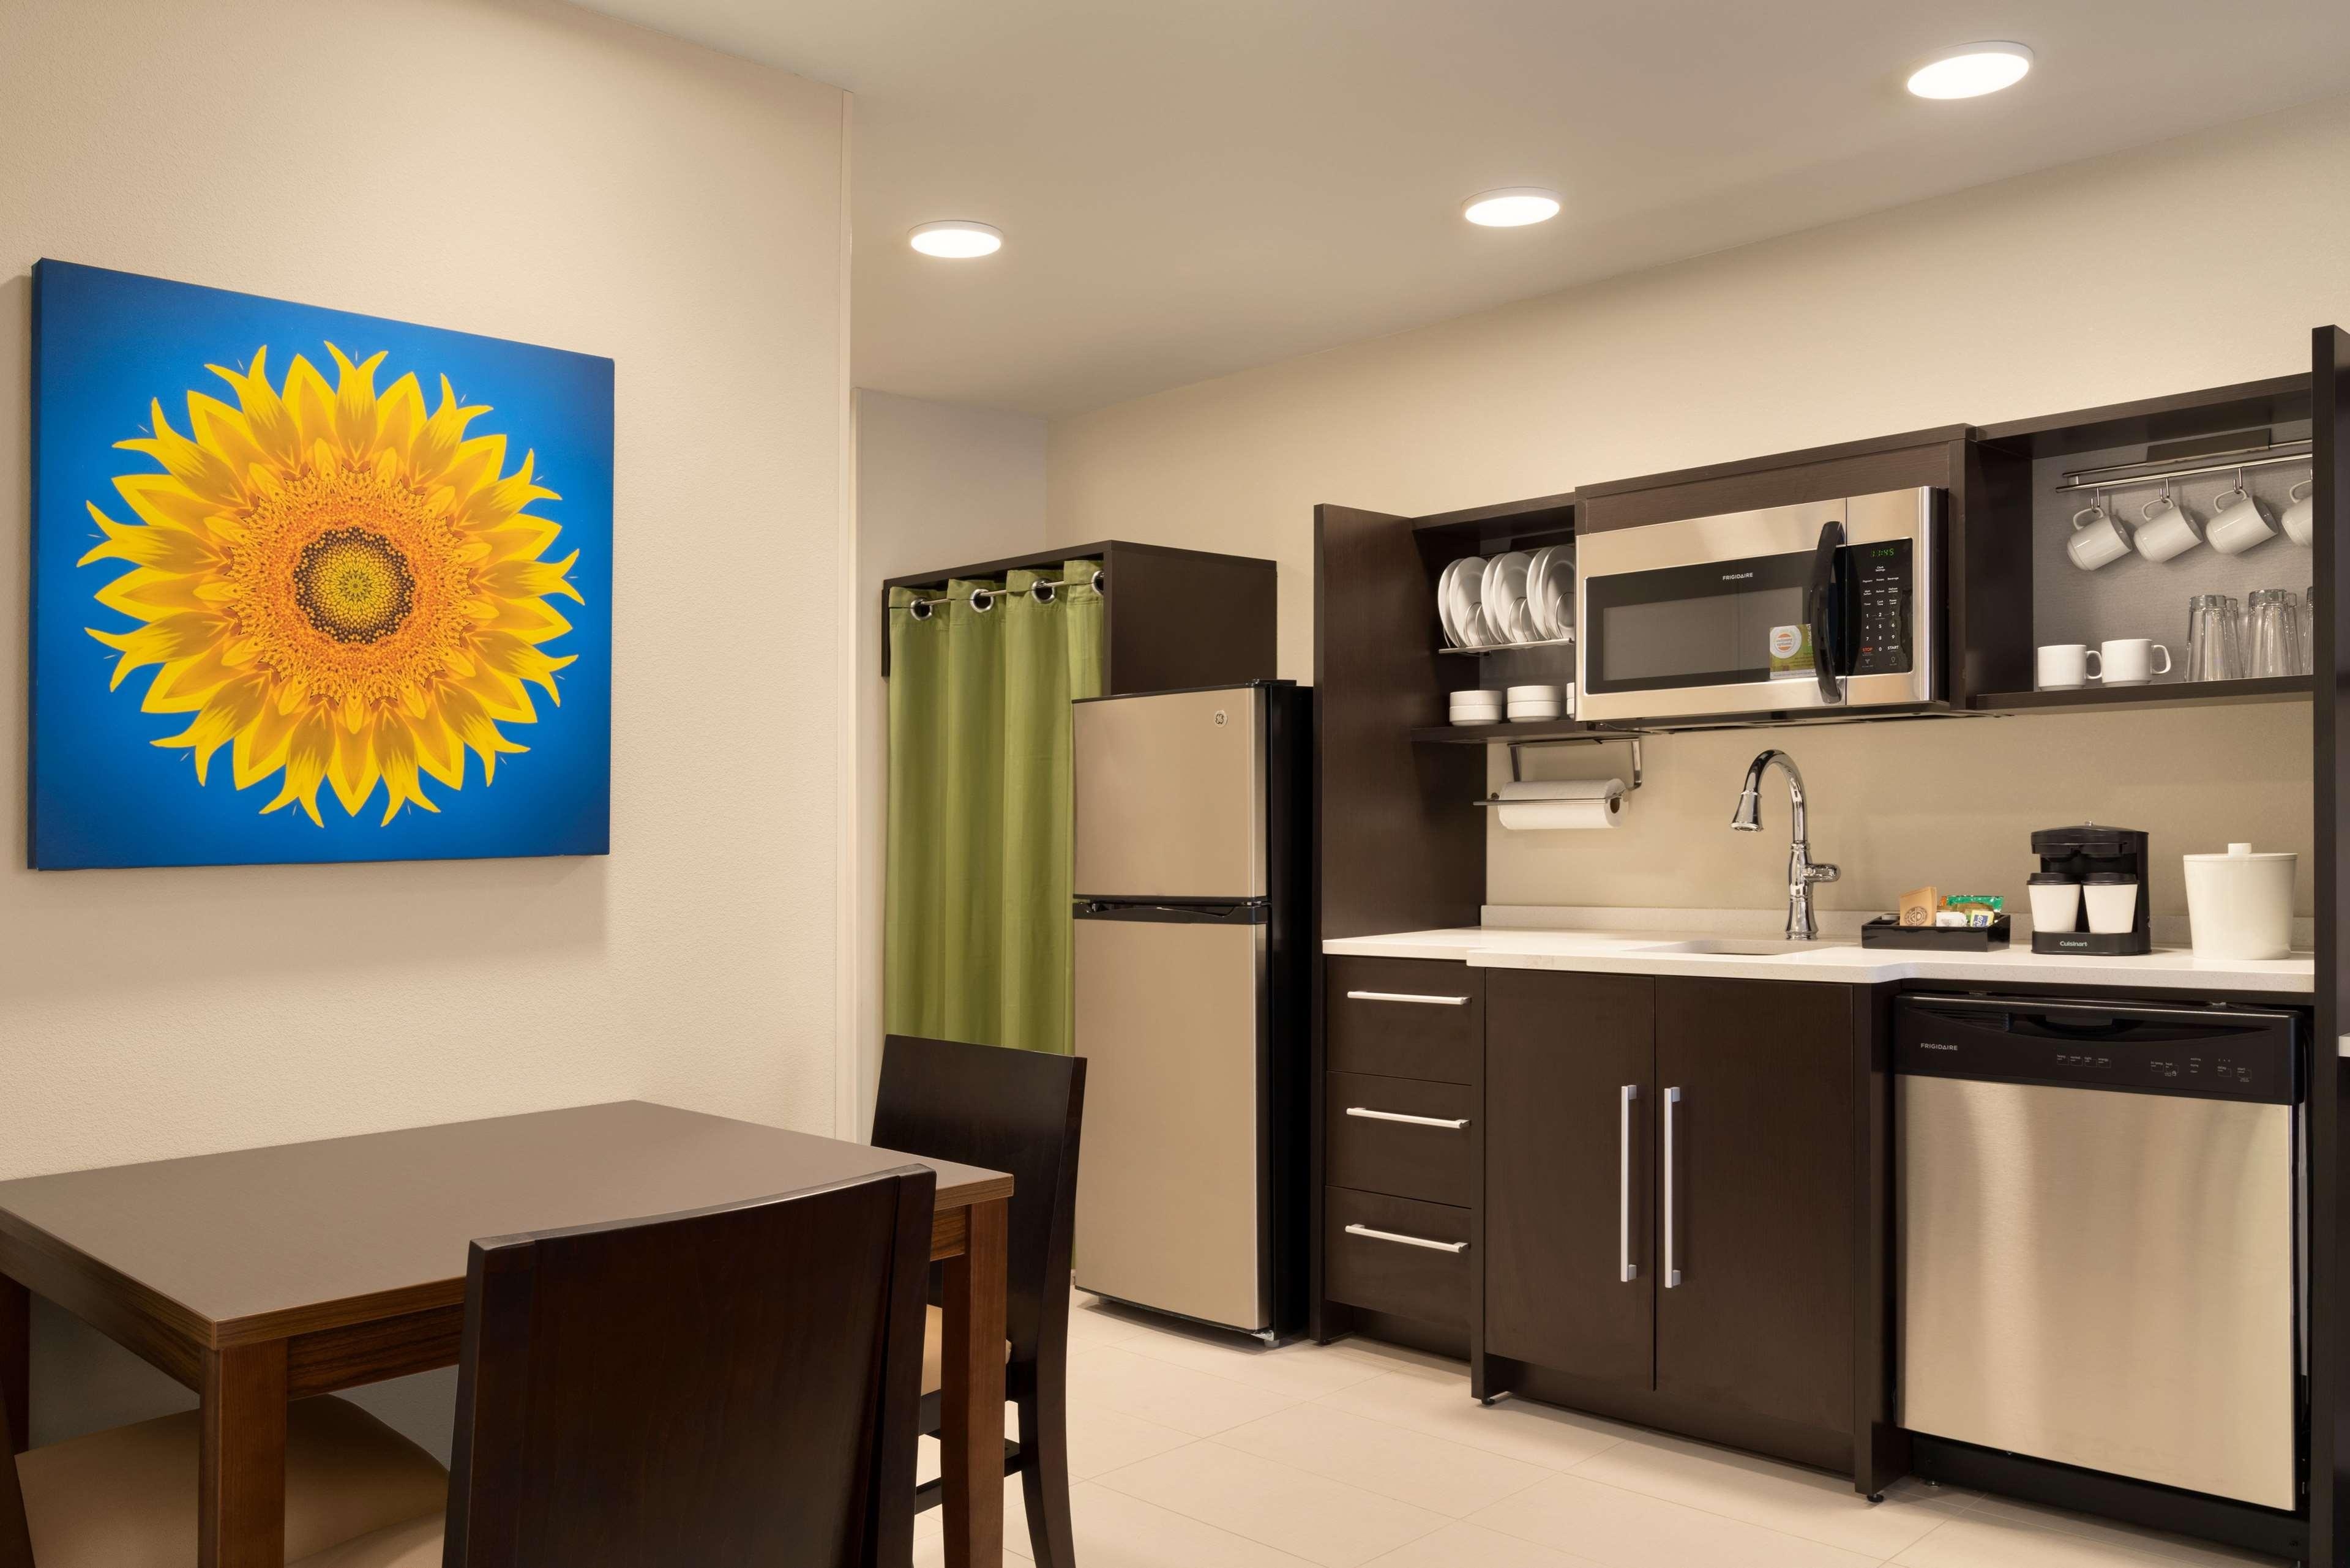 Home2 Suites By Hilton Leavenworth Downtown Leavenworth